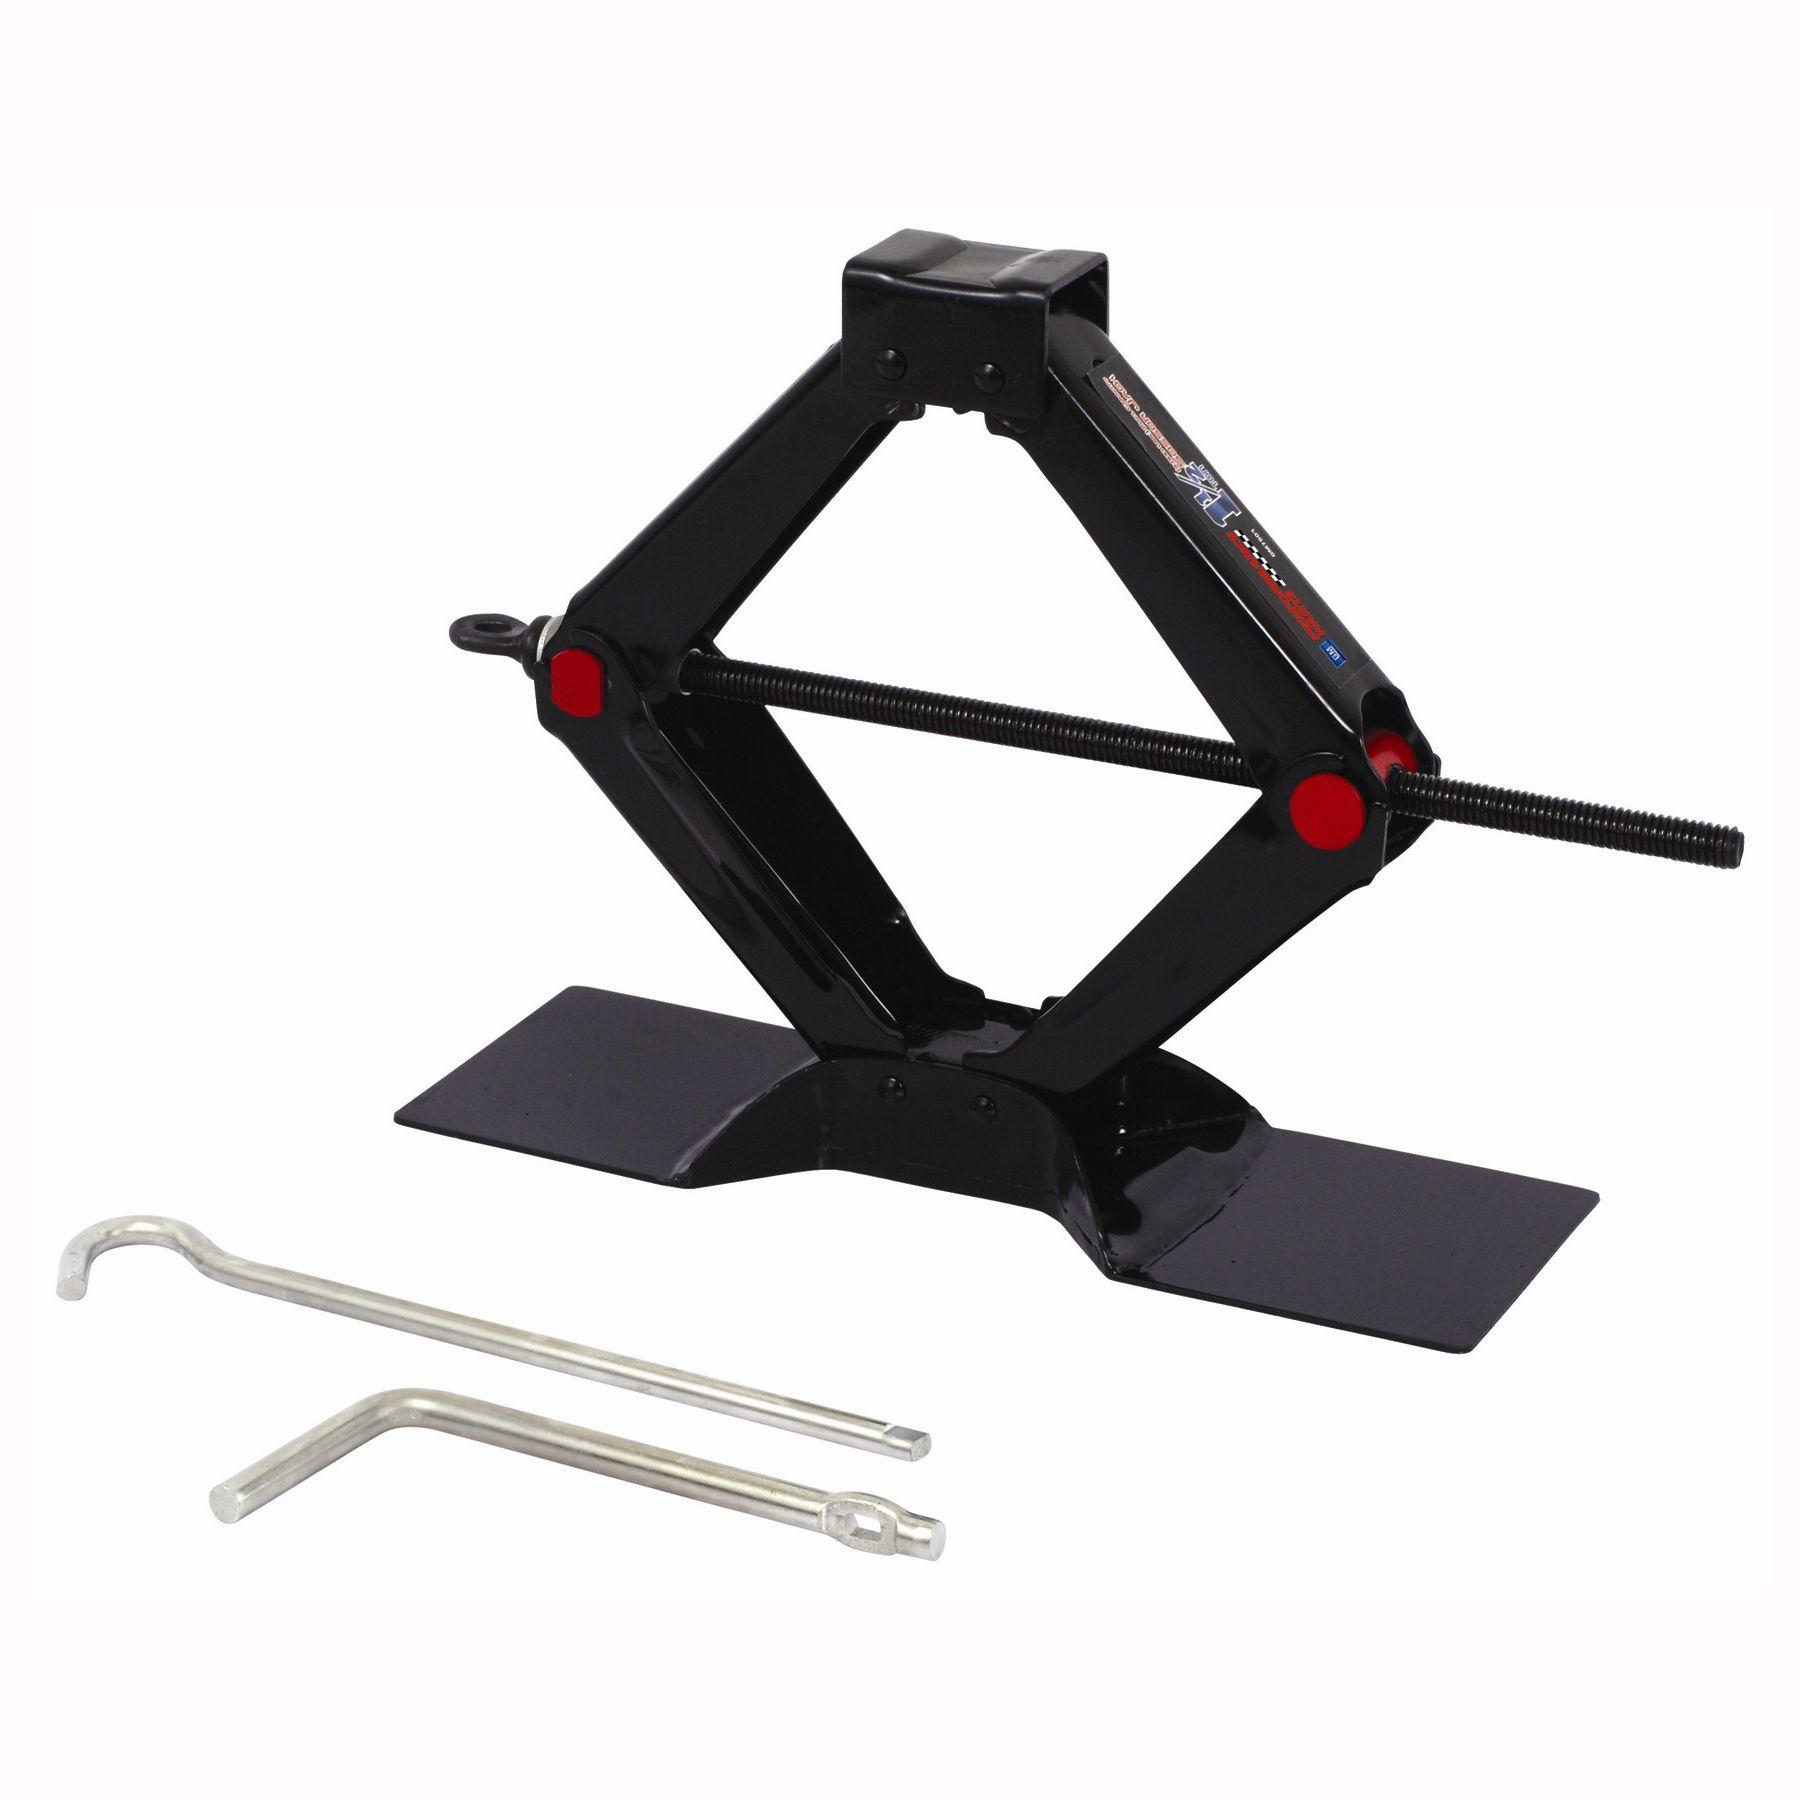 Gm Performance 1.5 Ton Scissor Jack - Tools Mechanics & Auto Lift Equipment Jacks